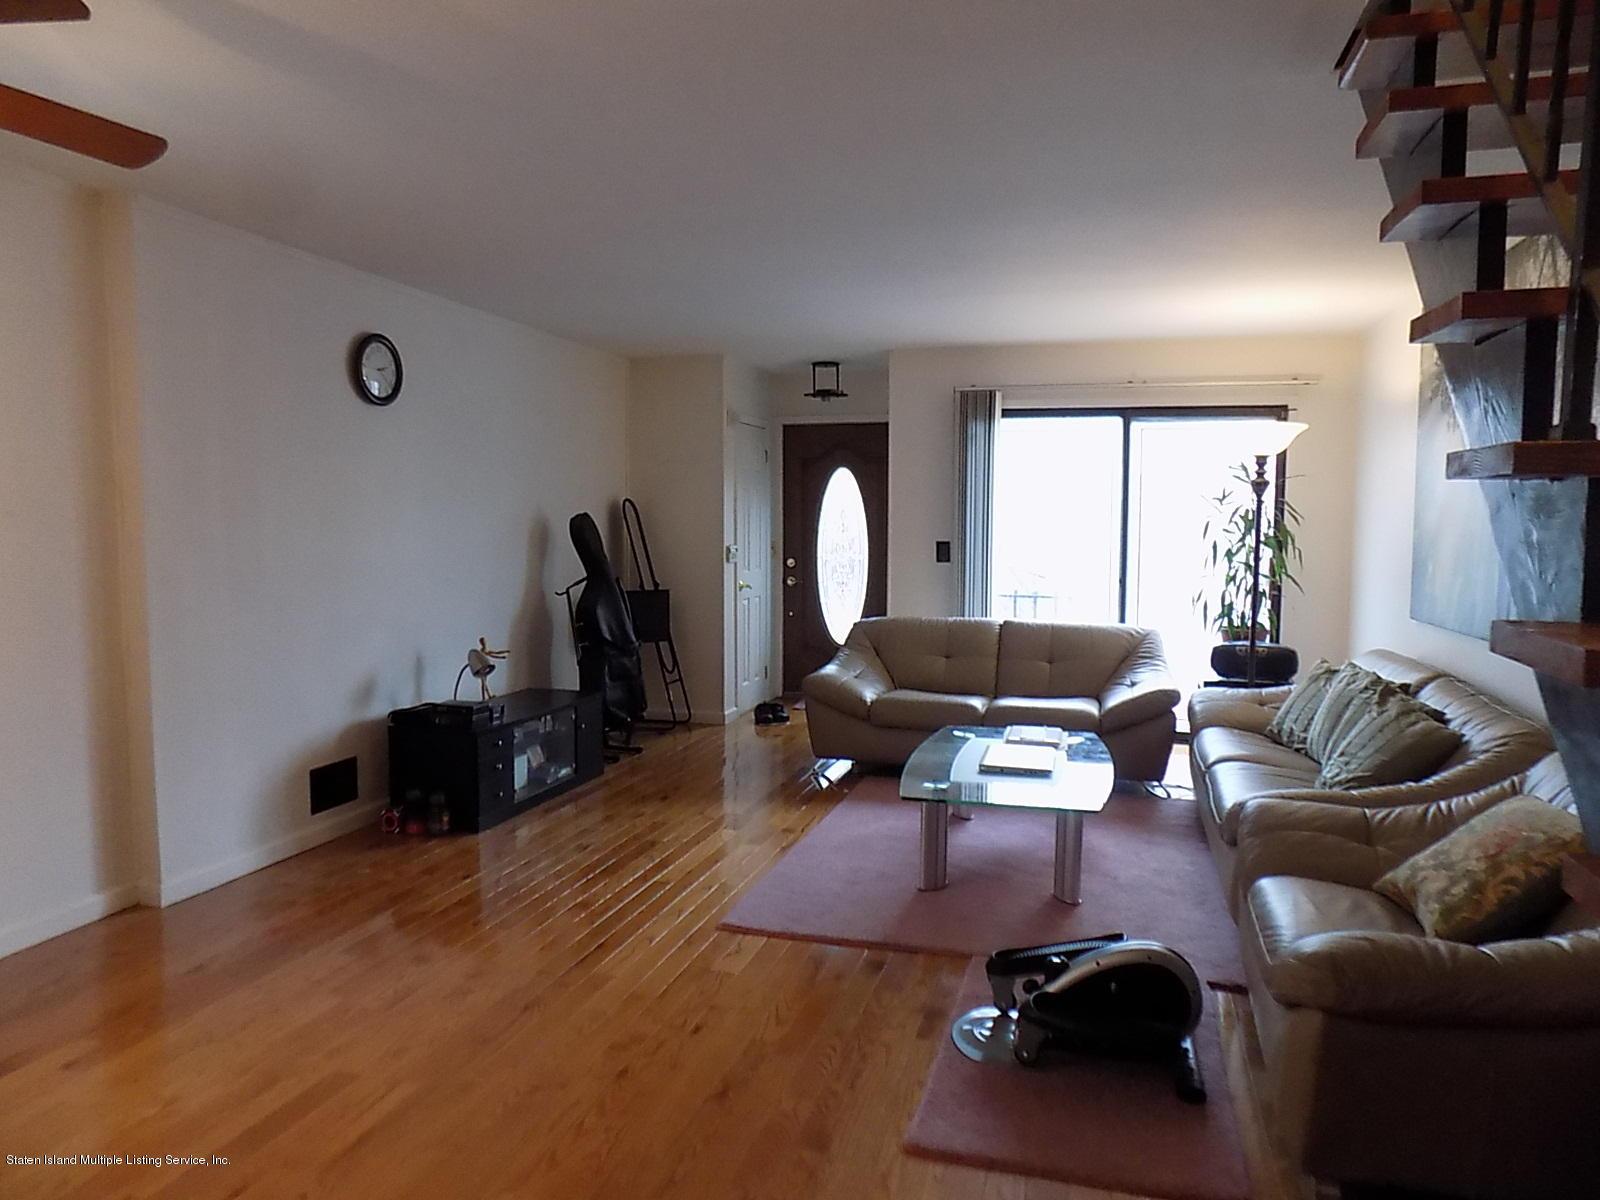 Single Family - Semi-Attached 85 Bogota Street  Staten Island, NY 10314, MLS-1126026-3